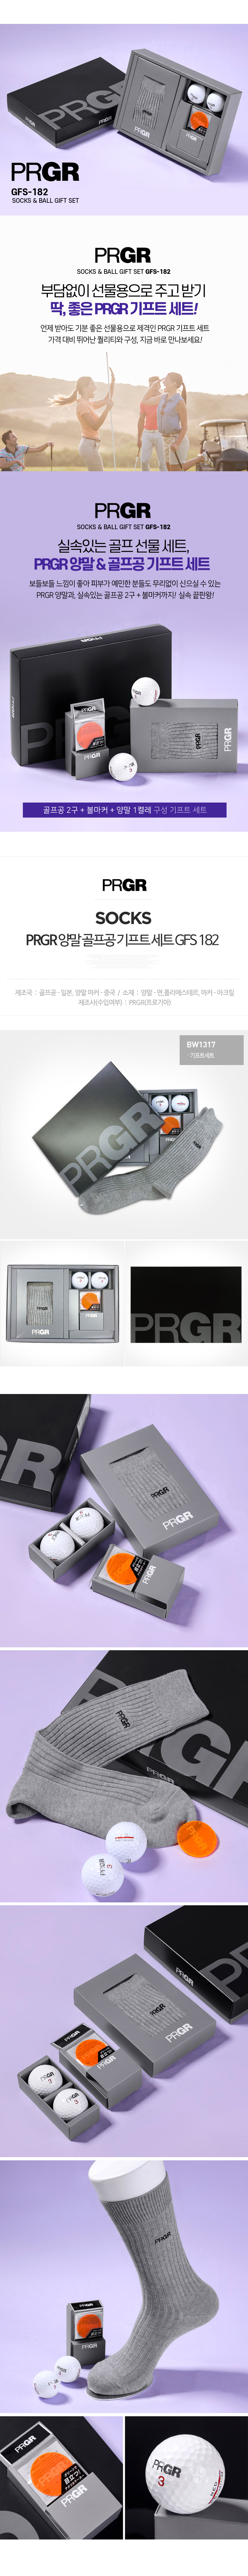 prgr_gift_set_BW1317_20.jpg